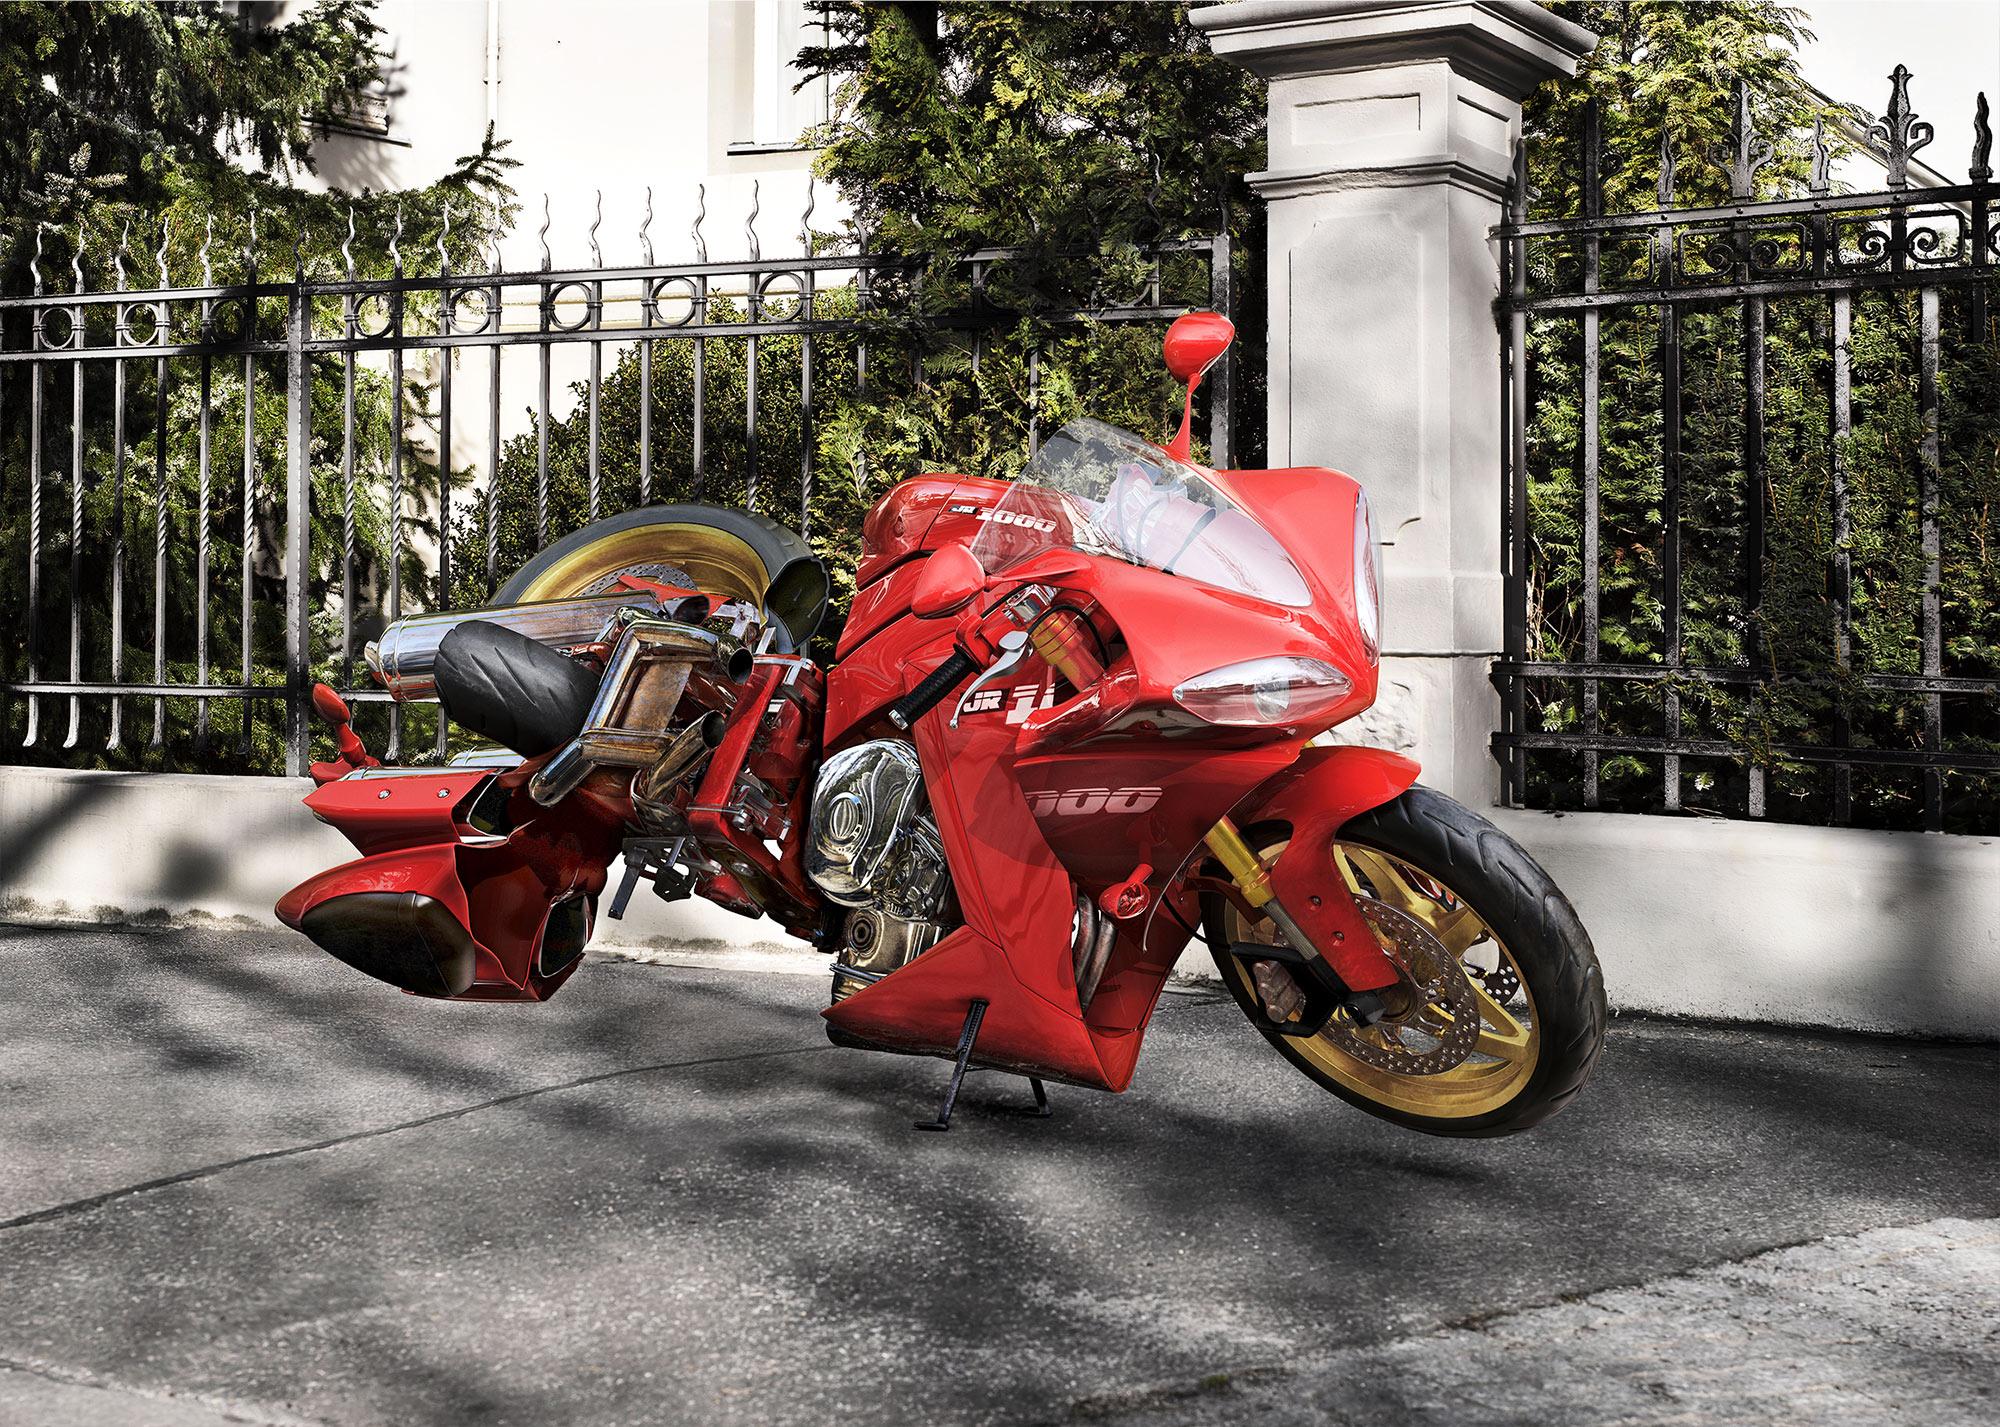 CGI Rendering 3d Transportation Bikeking24 Racer verdreht Motorrad twisted bikes HDRI Backplate Sphere Idris Kolodziej